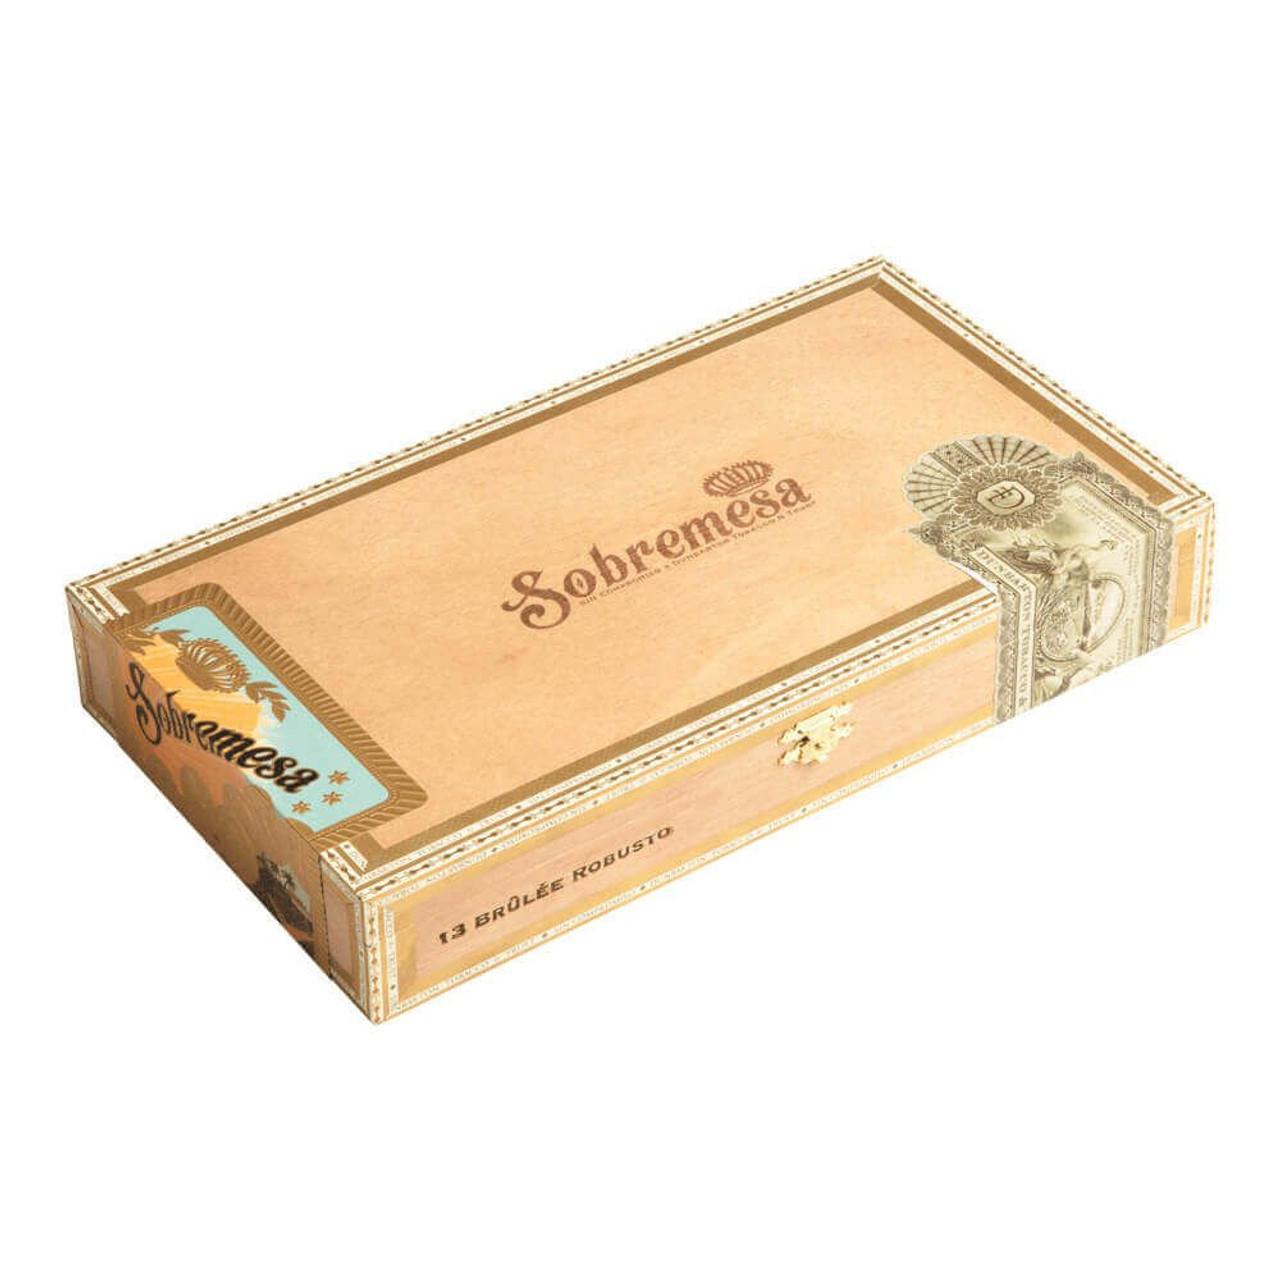 Sobremesa Brulee Toro 2019 Cigars - 6.0 x 52 (Box of 13)